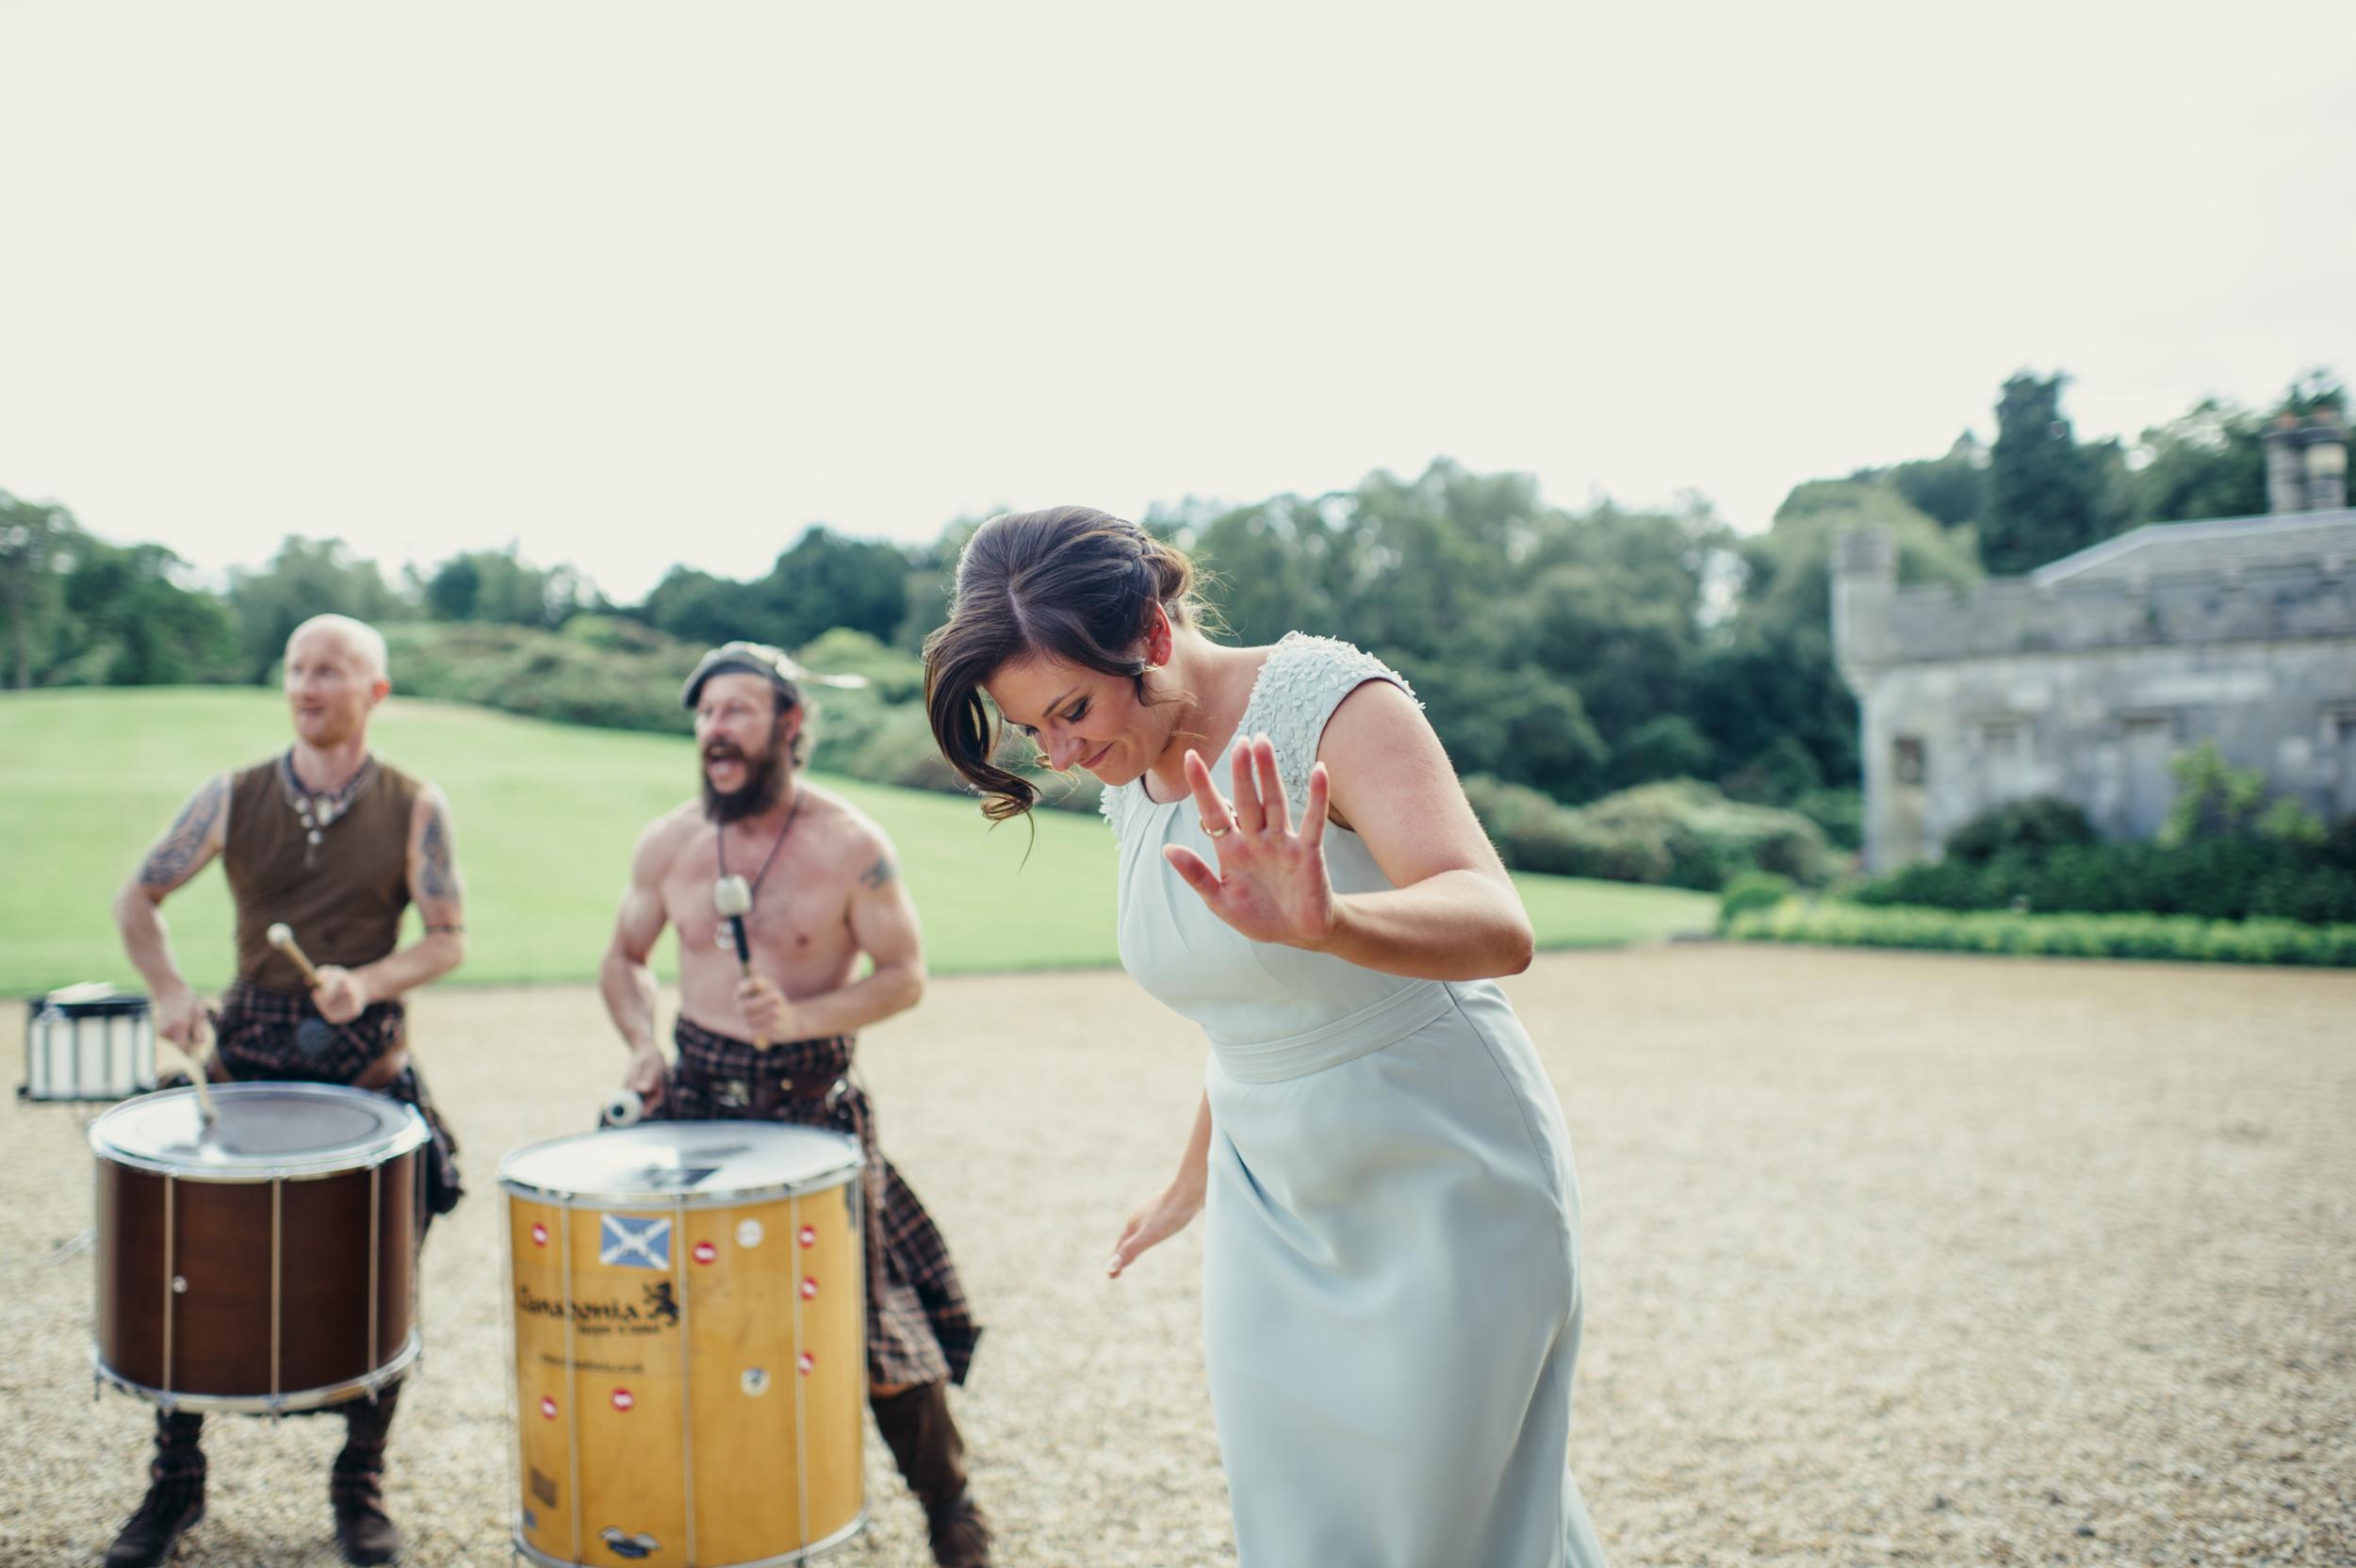 0139-lisa-devine-alternative-creative-wedding-photography-glasgow-edinburgh.JPG